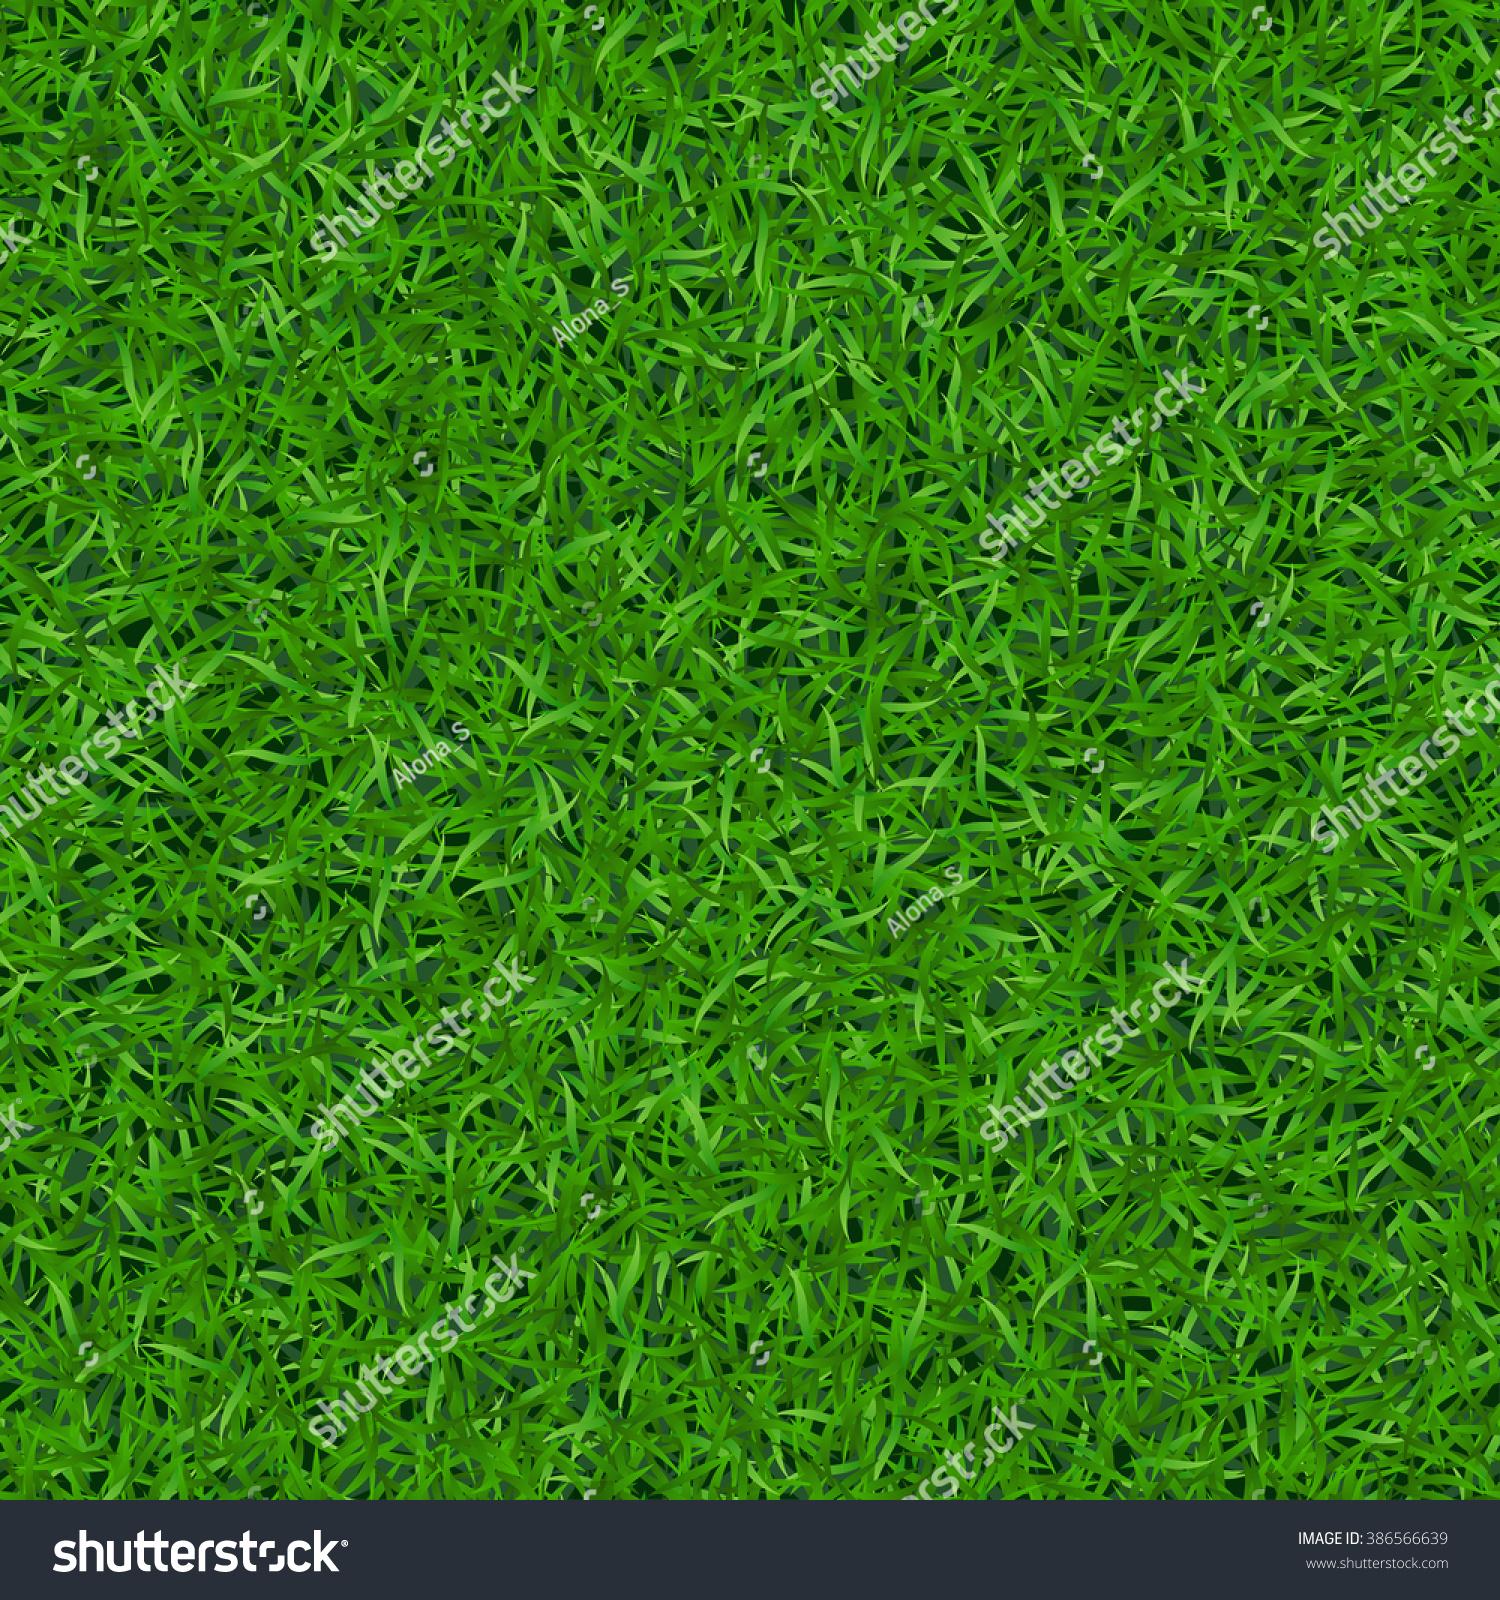 abstract grass wallpaper - photo #19